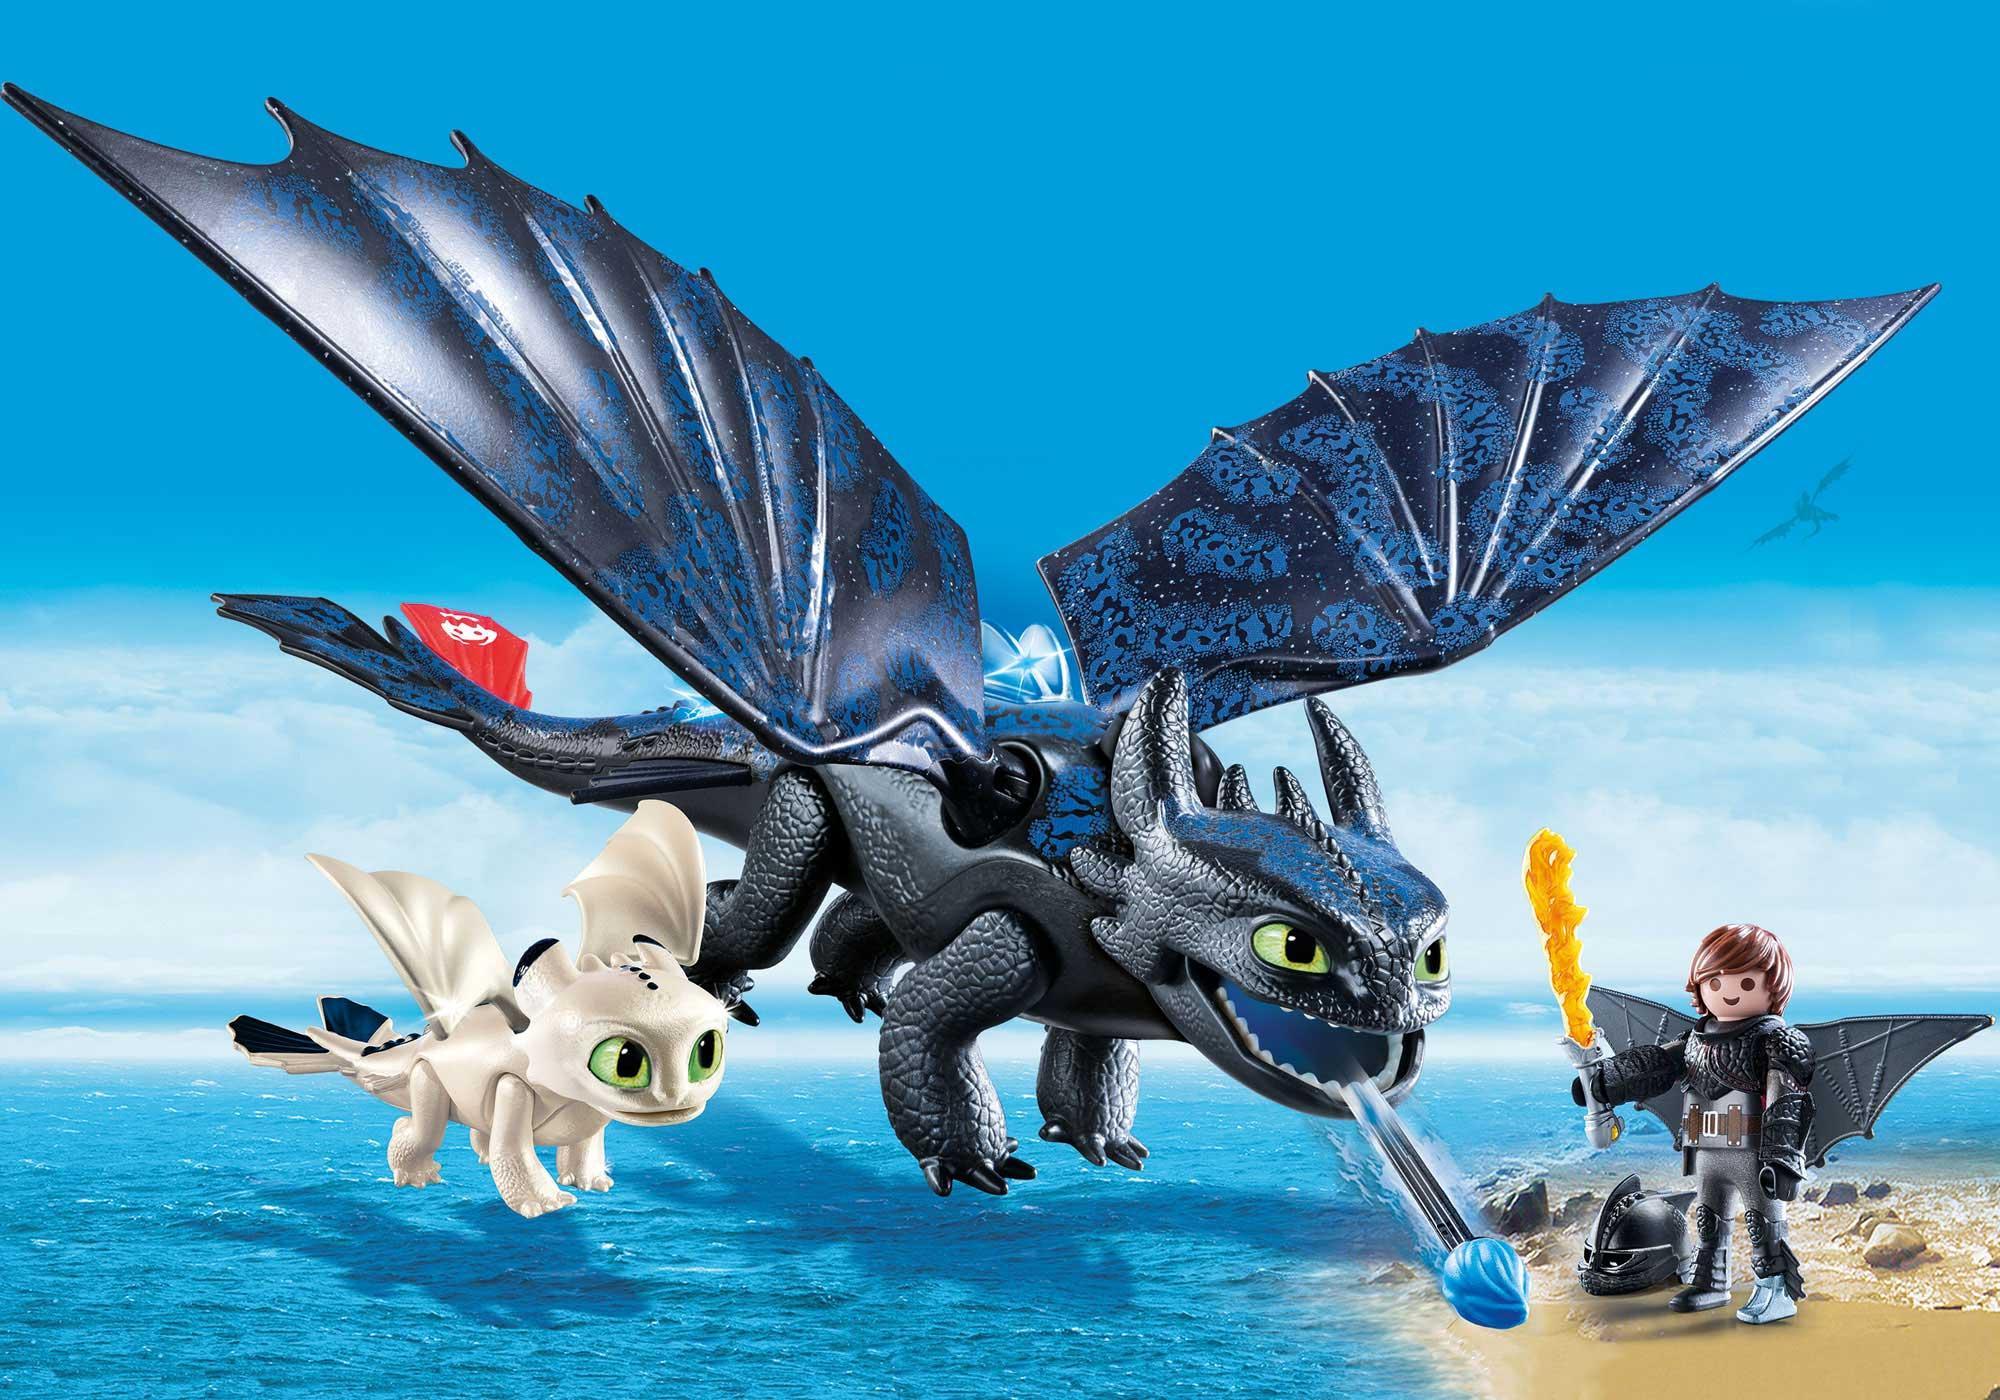 http://media.playmobil.com/i/playmobil/70037_product_detail/Ohnezahn und Hicks mit Babydrachen